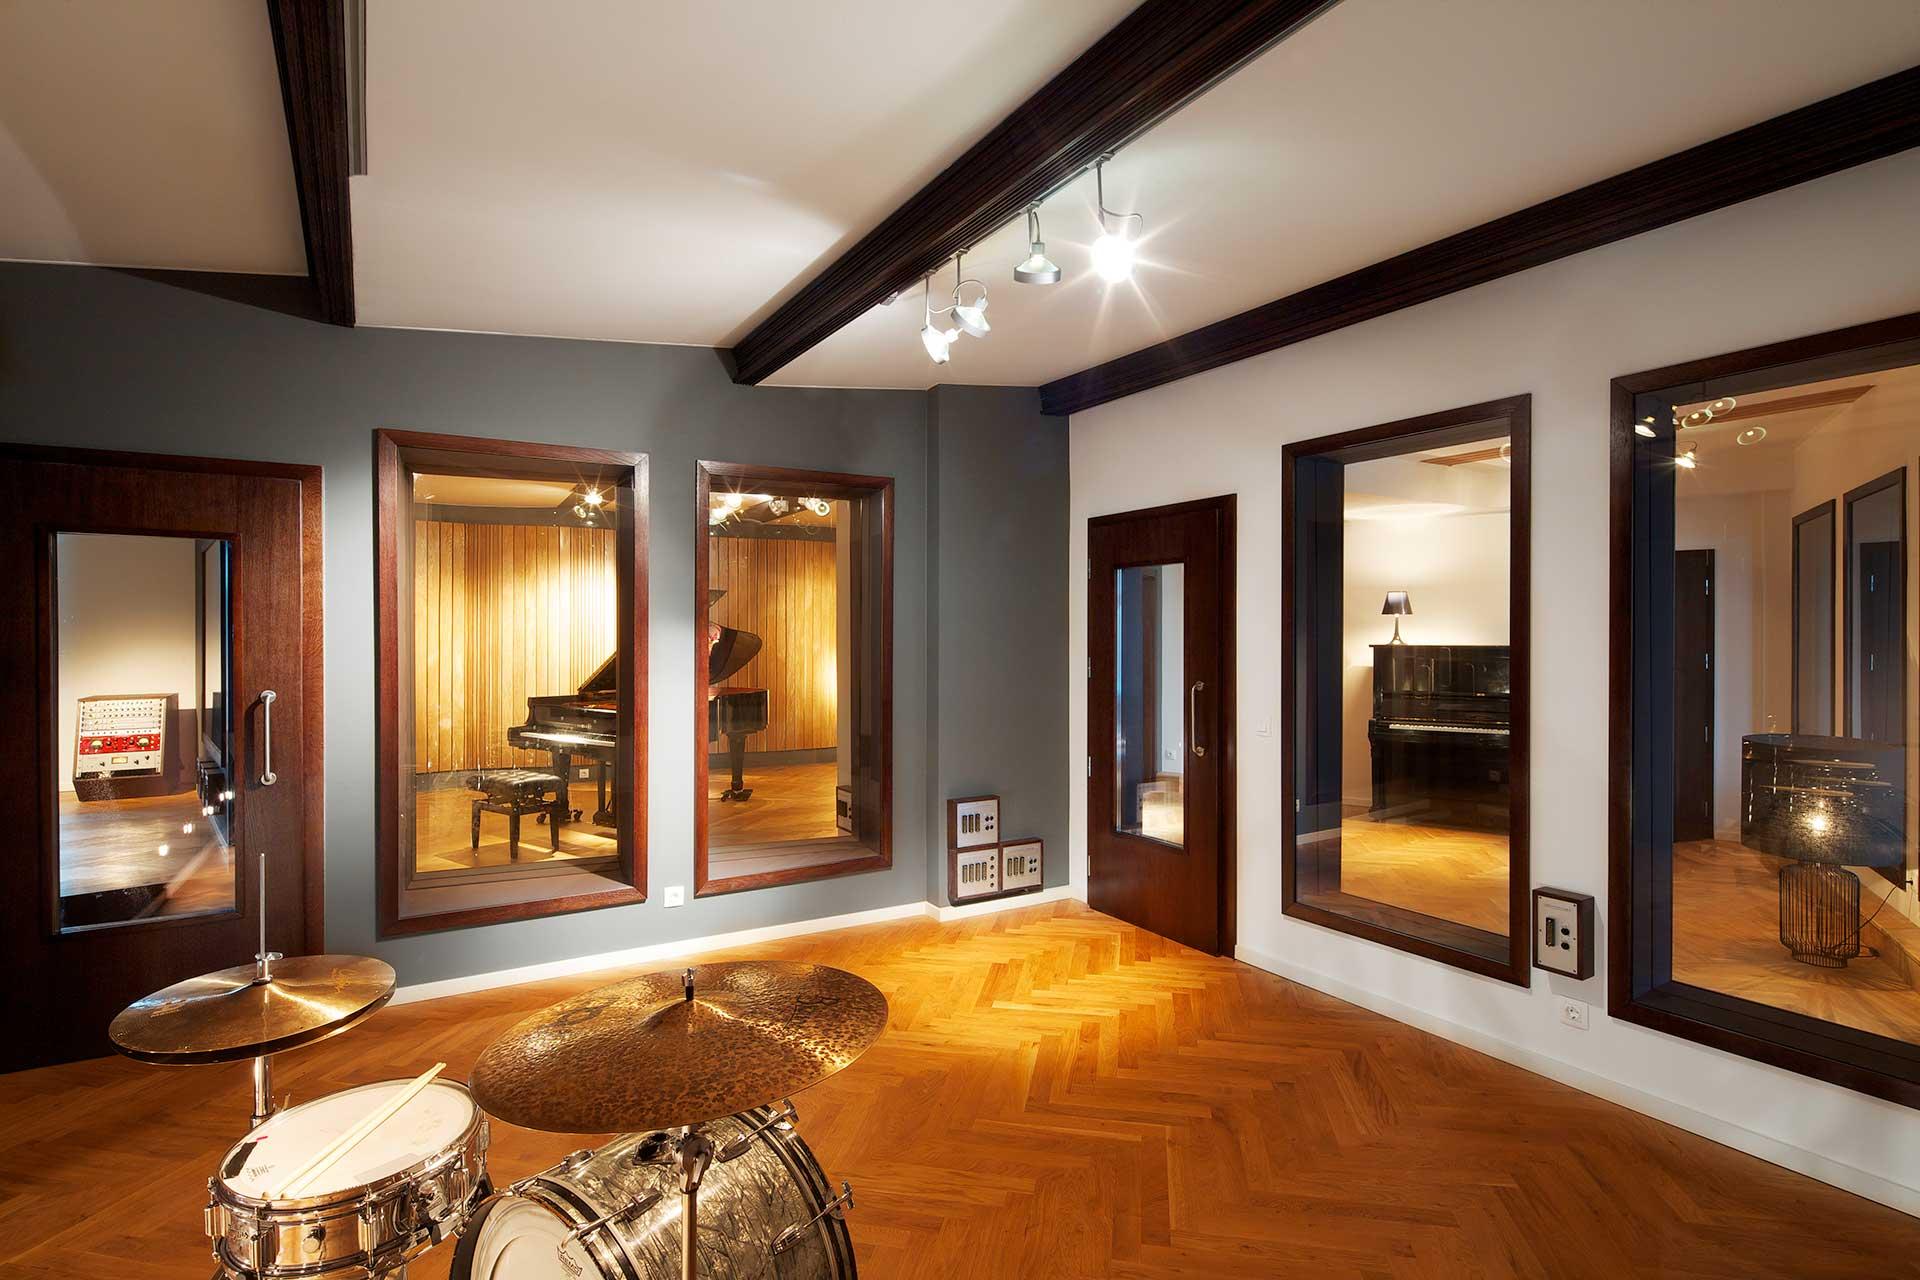 Sensational High End Studio Jrs Jazzanova Recording Studio Berlin Germany Largest Home Design Picture Inspirations Pitcheantrous